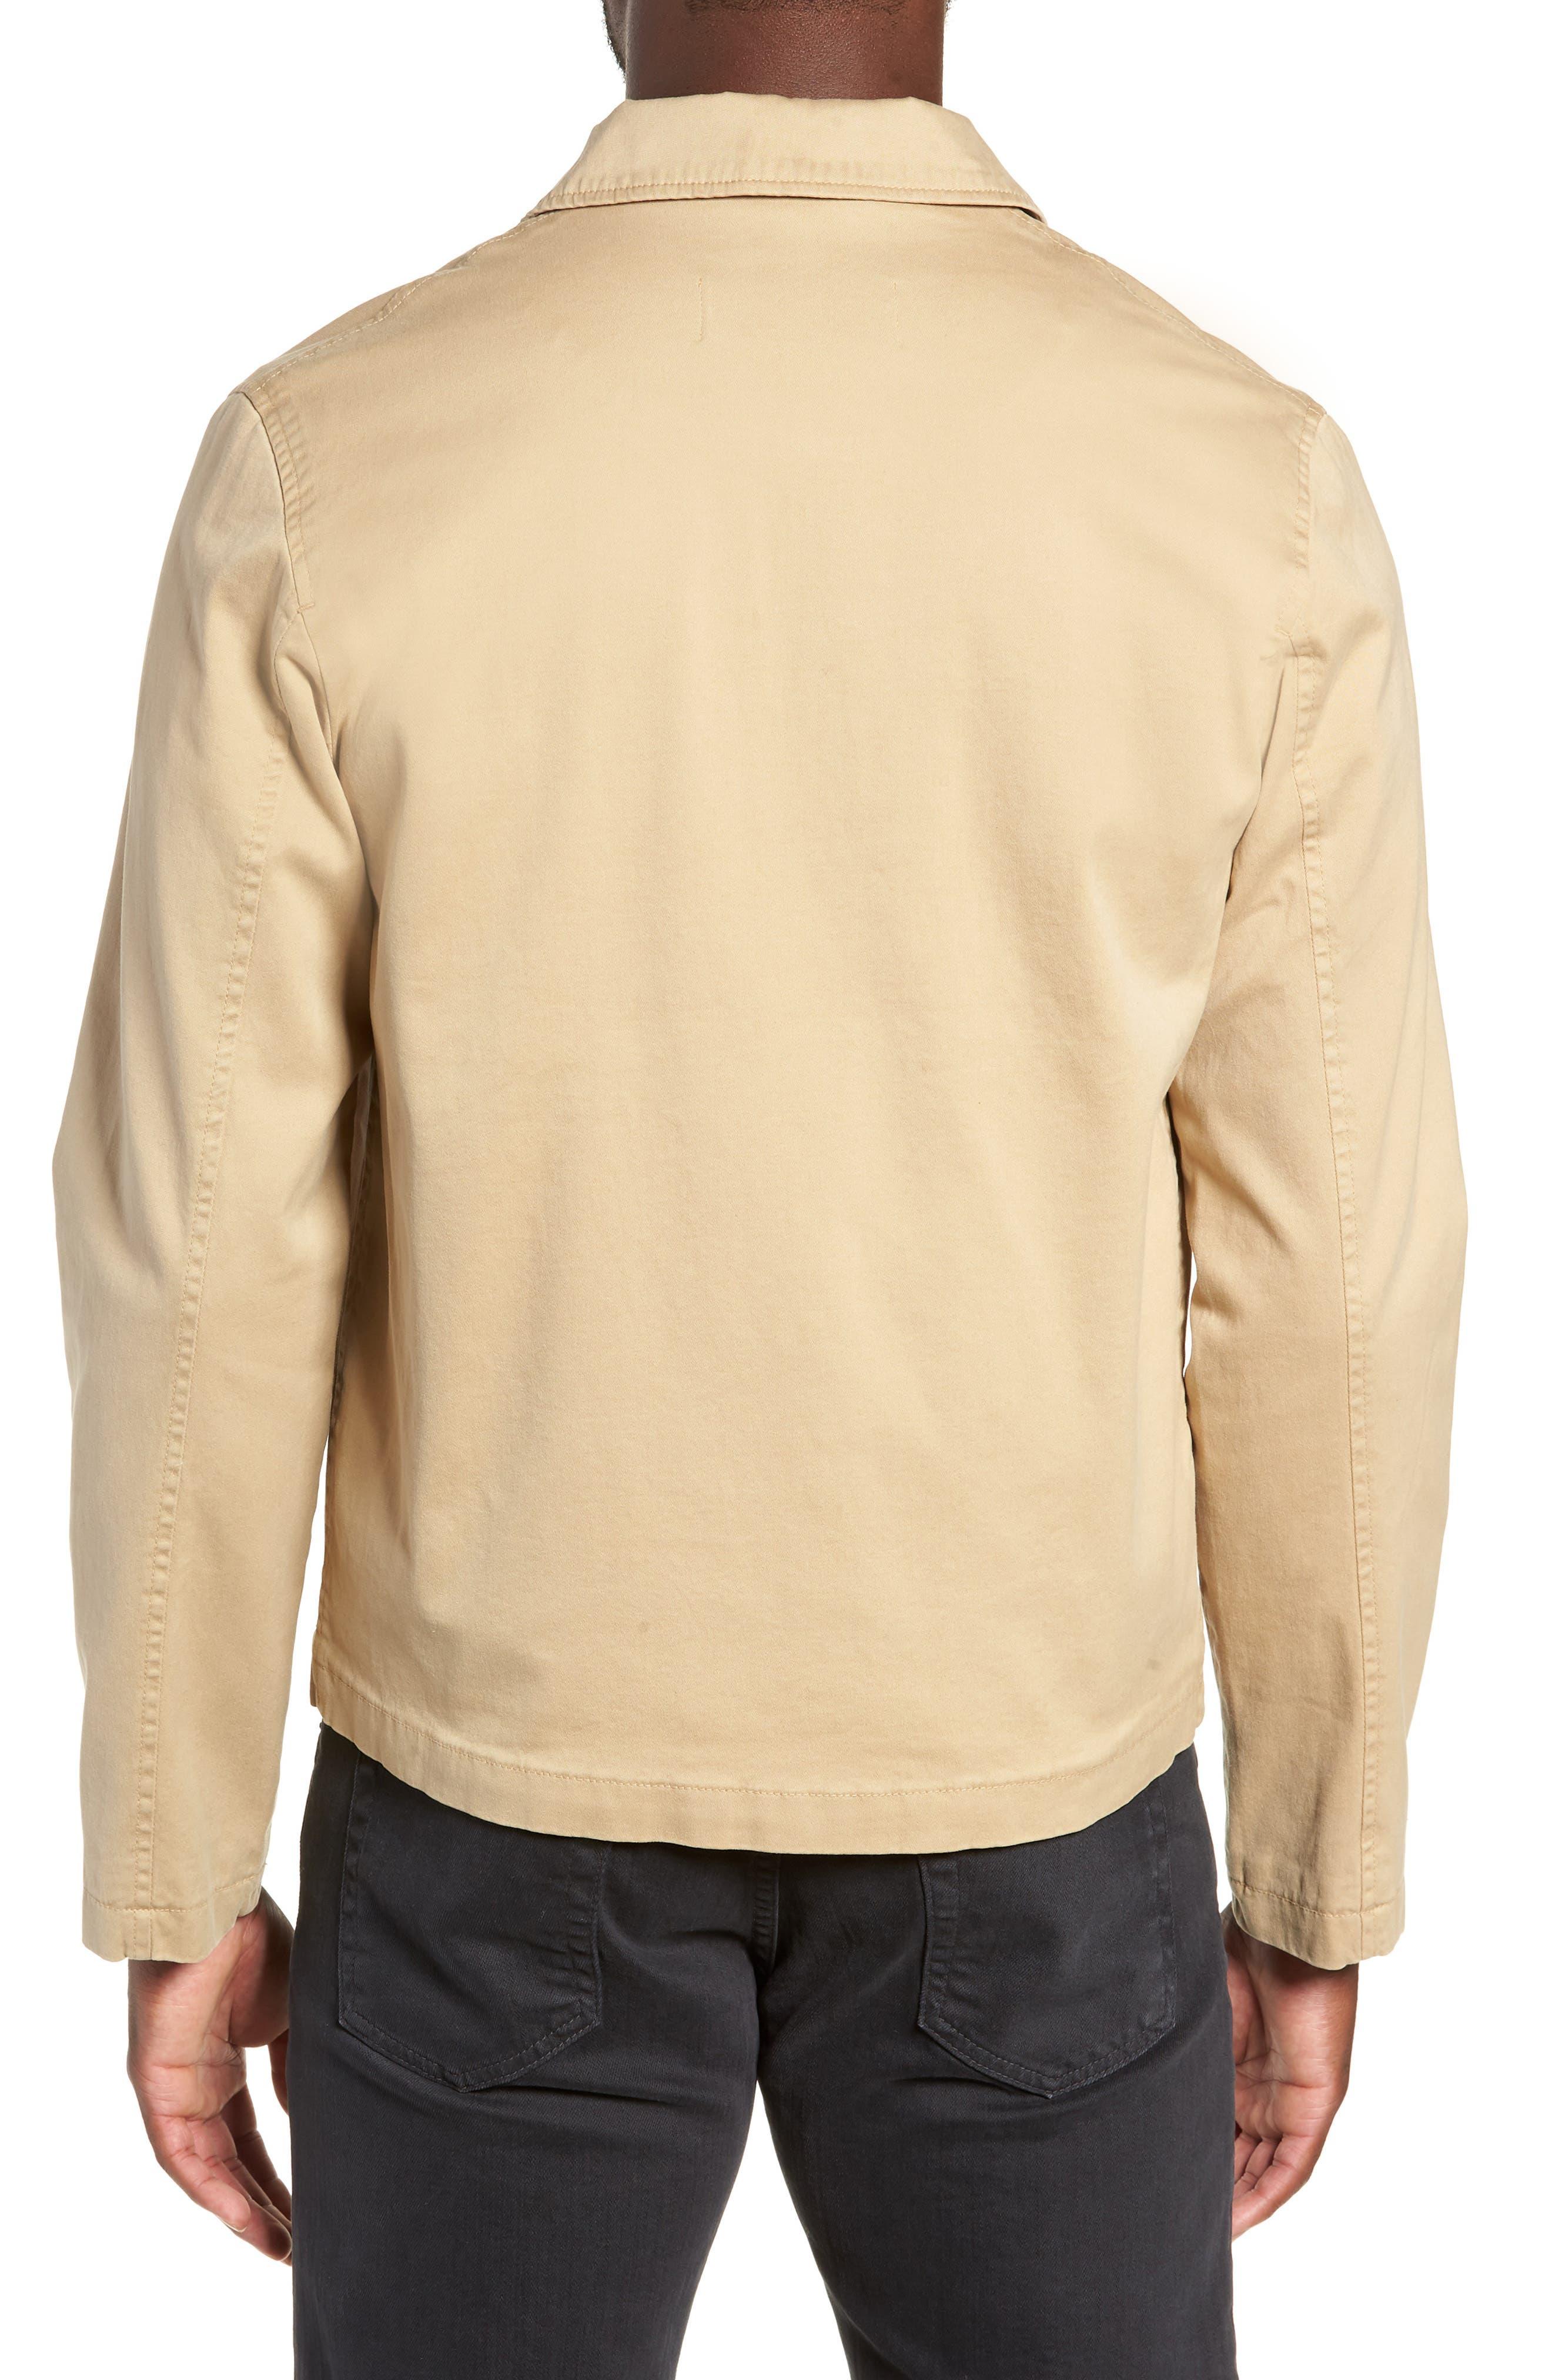 Groundhog Jacket,                             Alternate thumbnail 2, color,                             SAND